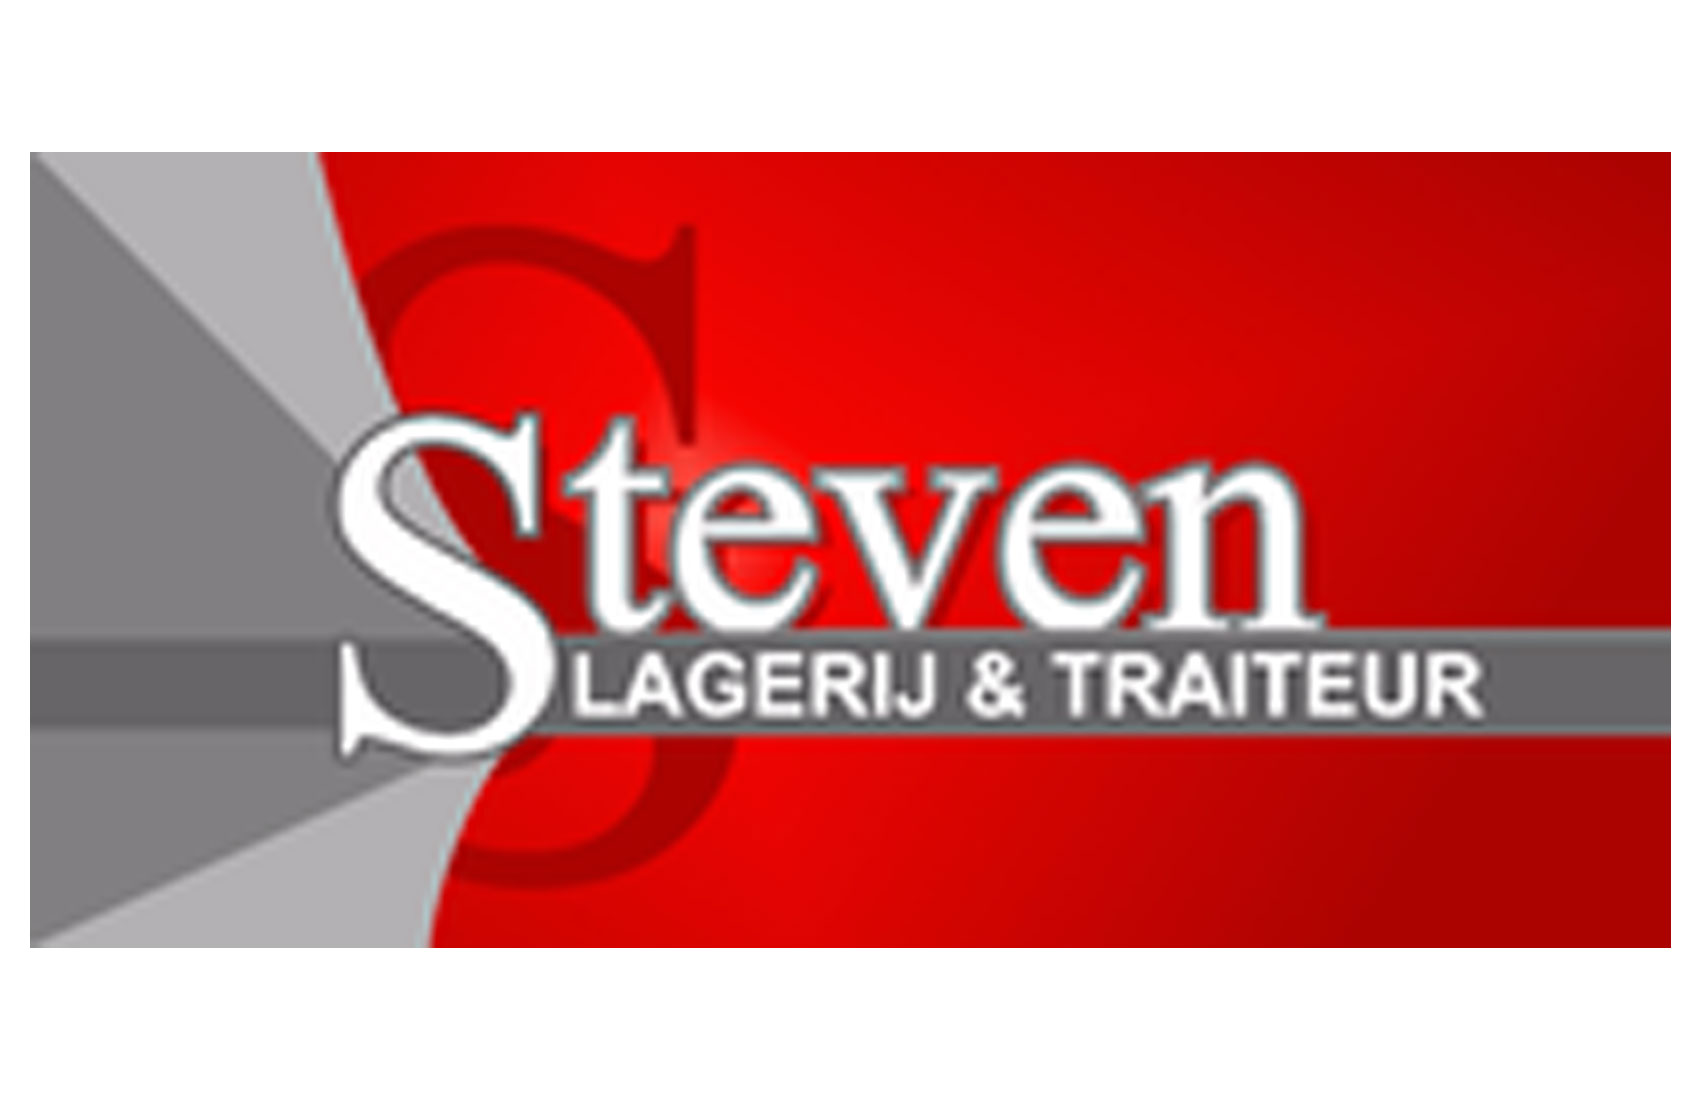 Slagerij Steven